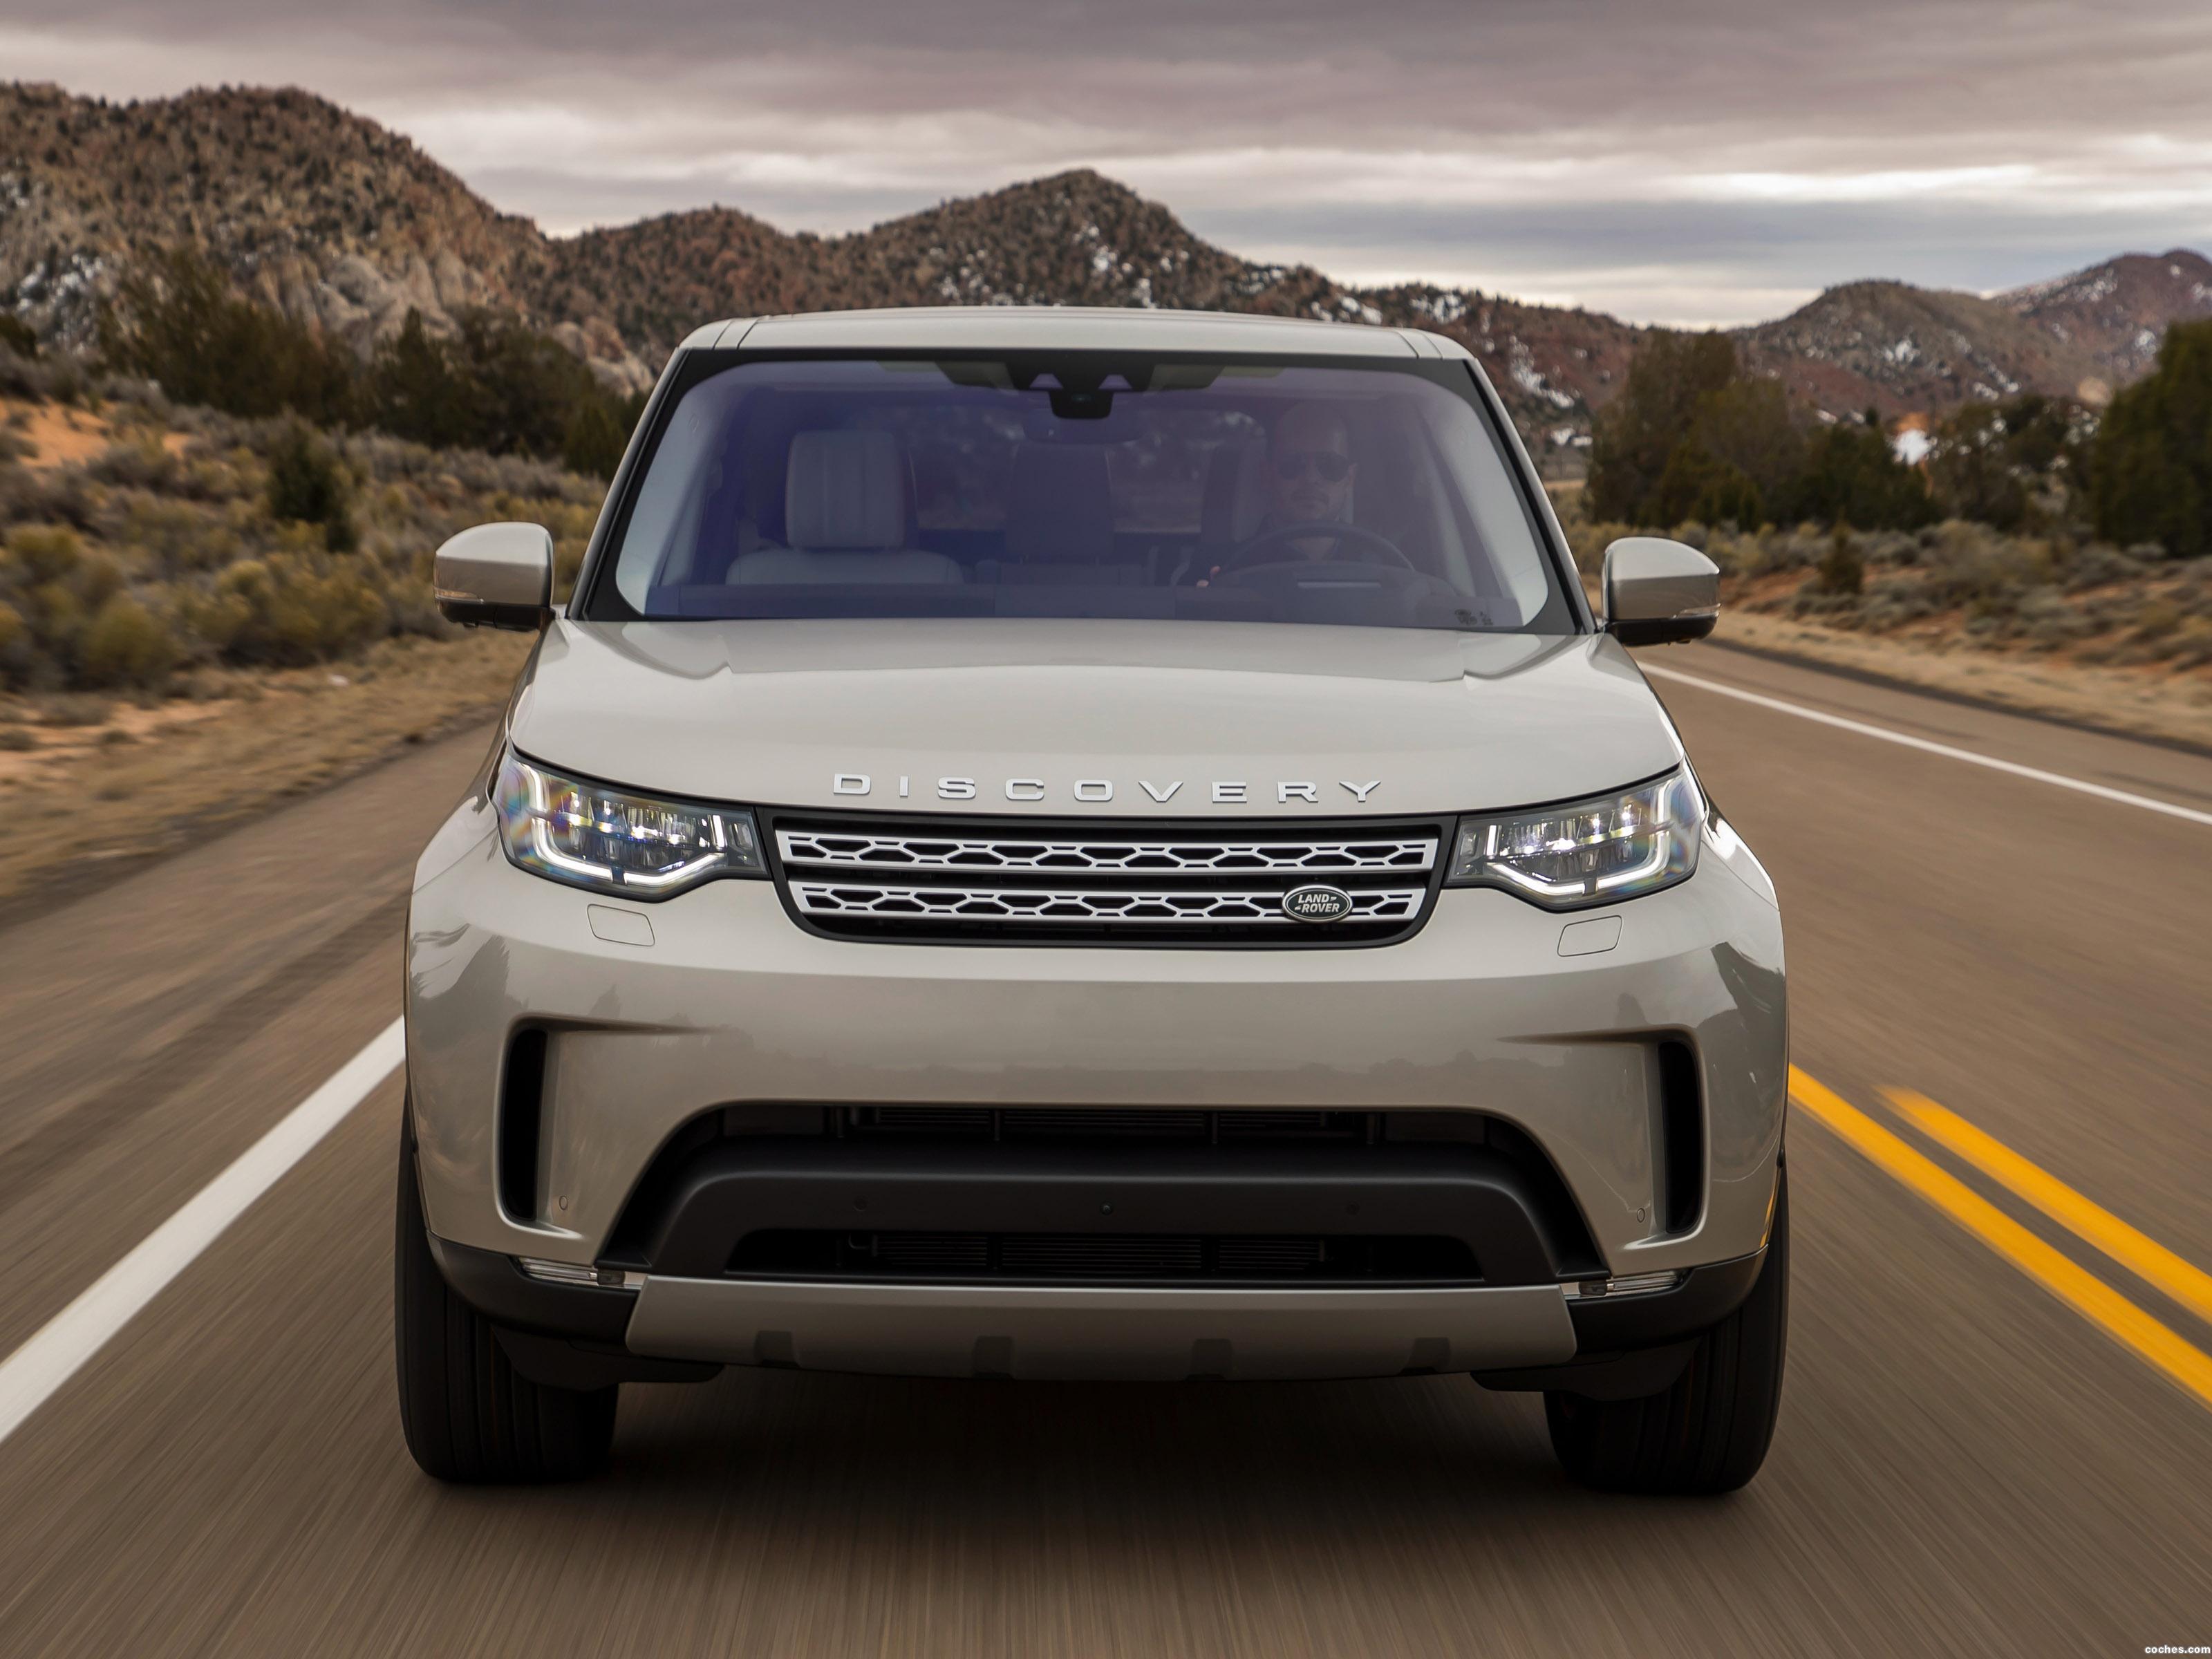 Foto 20 de Land Rover Discovery HSE 2017